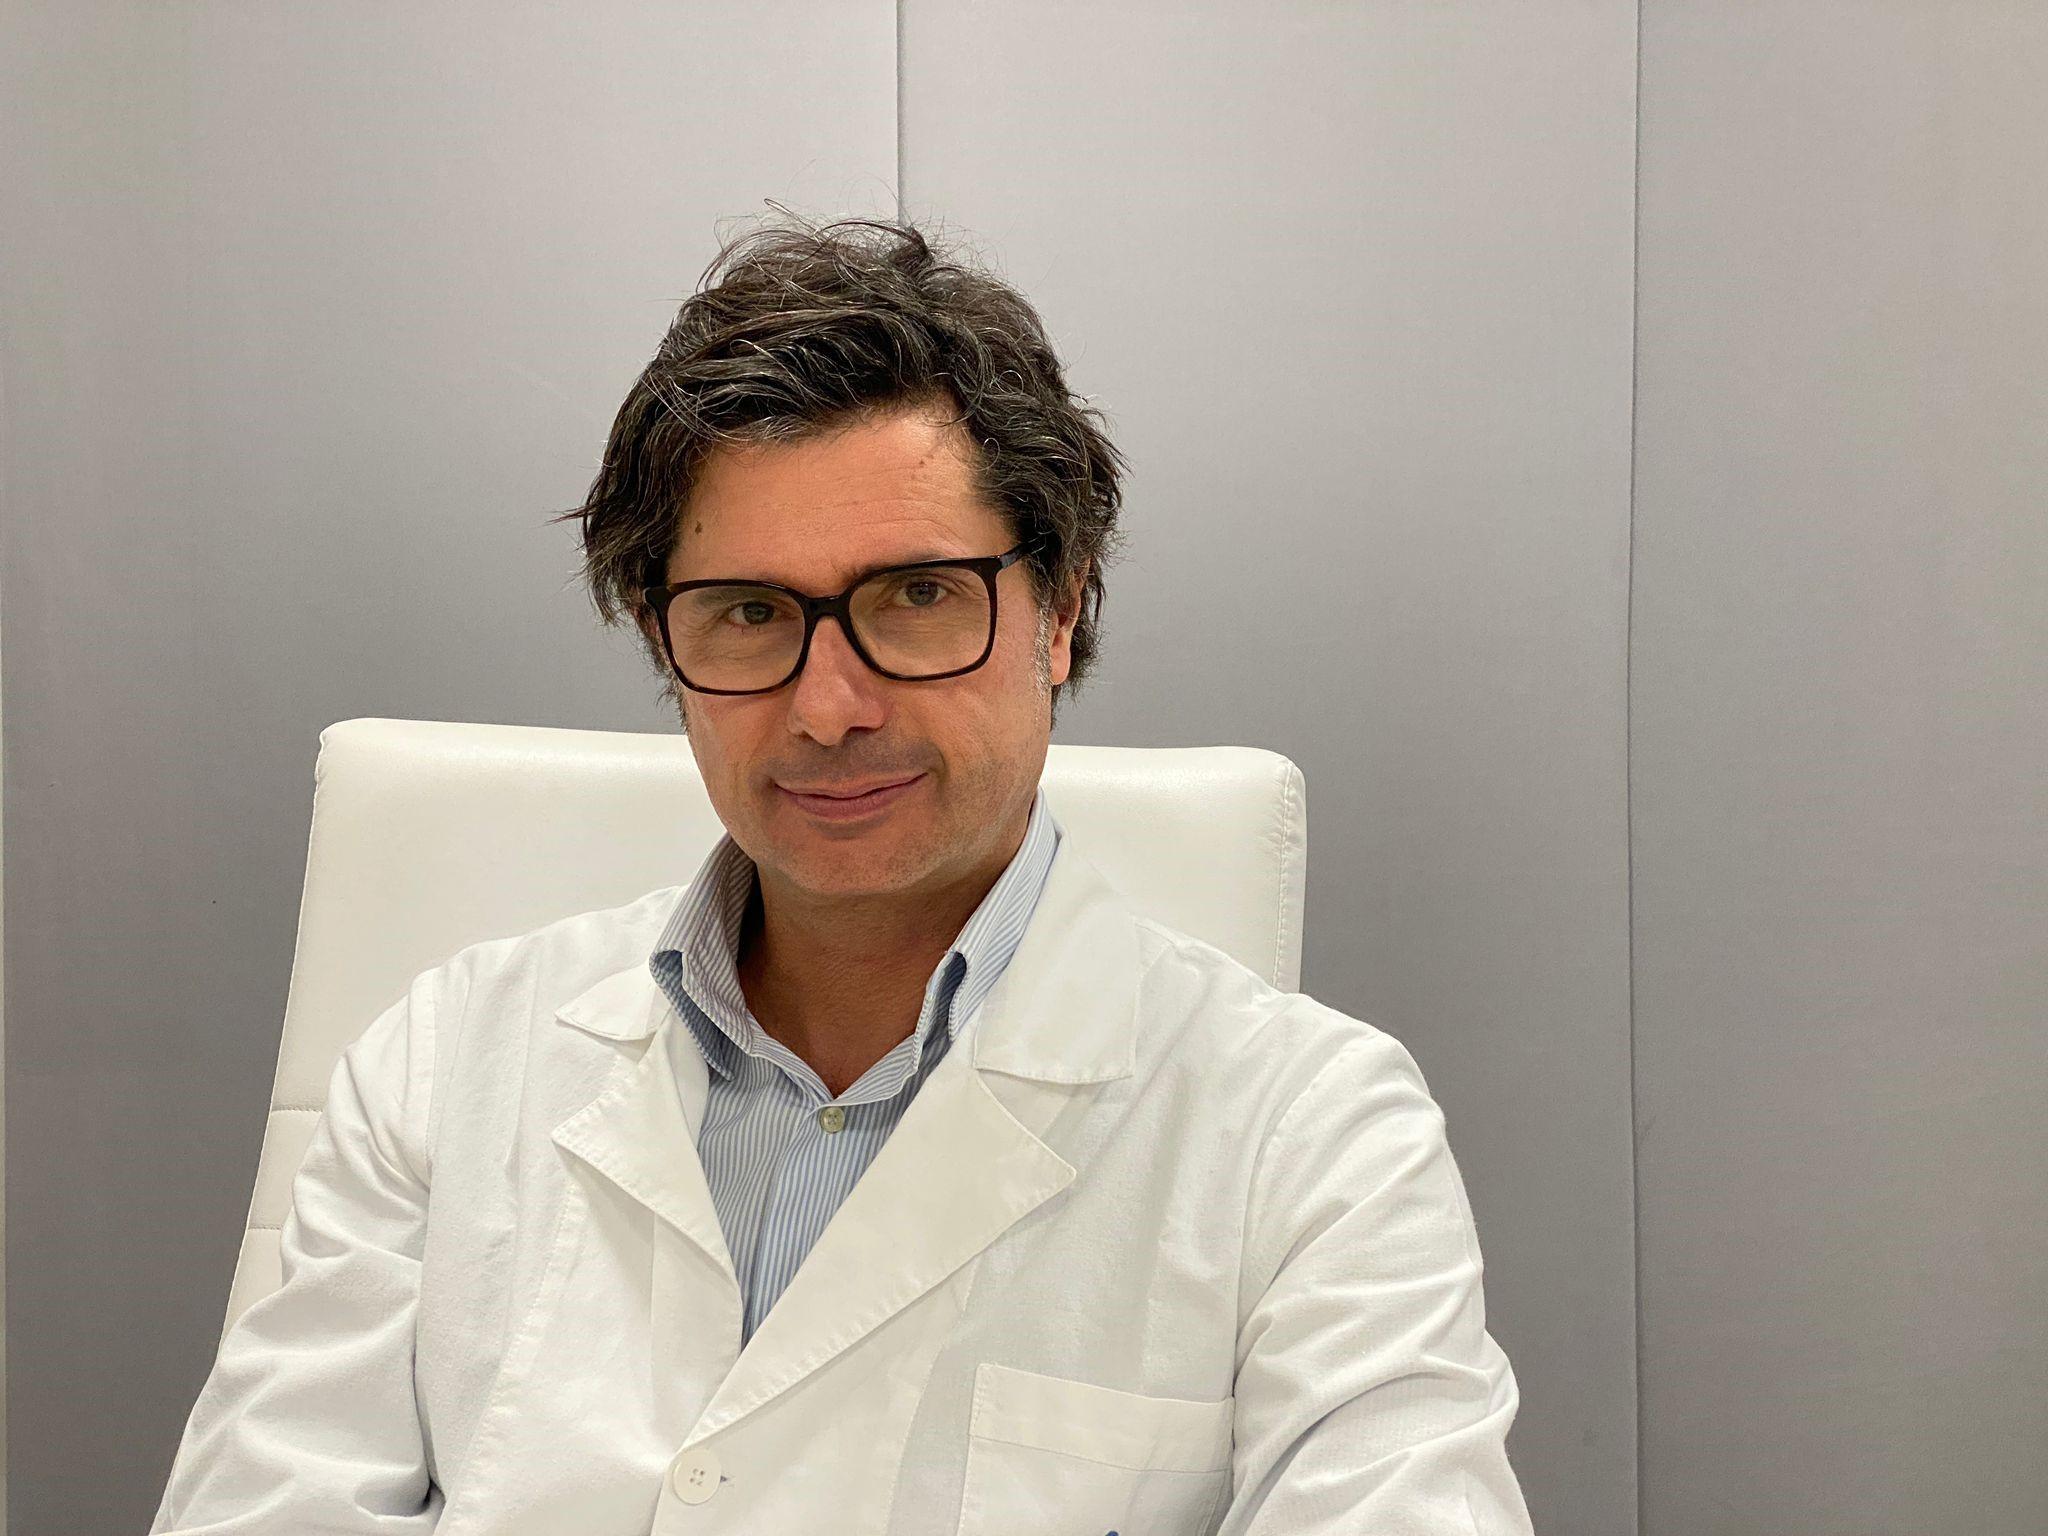 Dott. MAURIZIO MARINANGELI